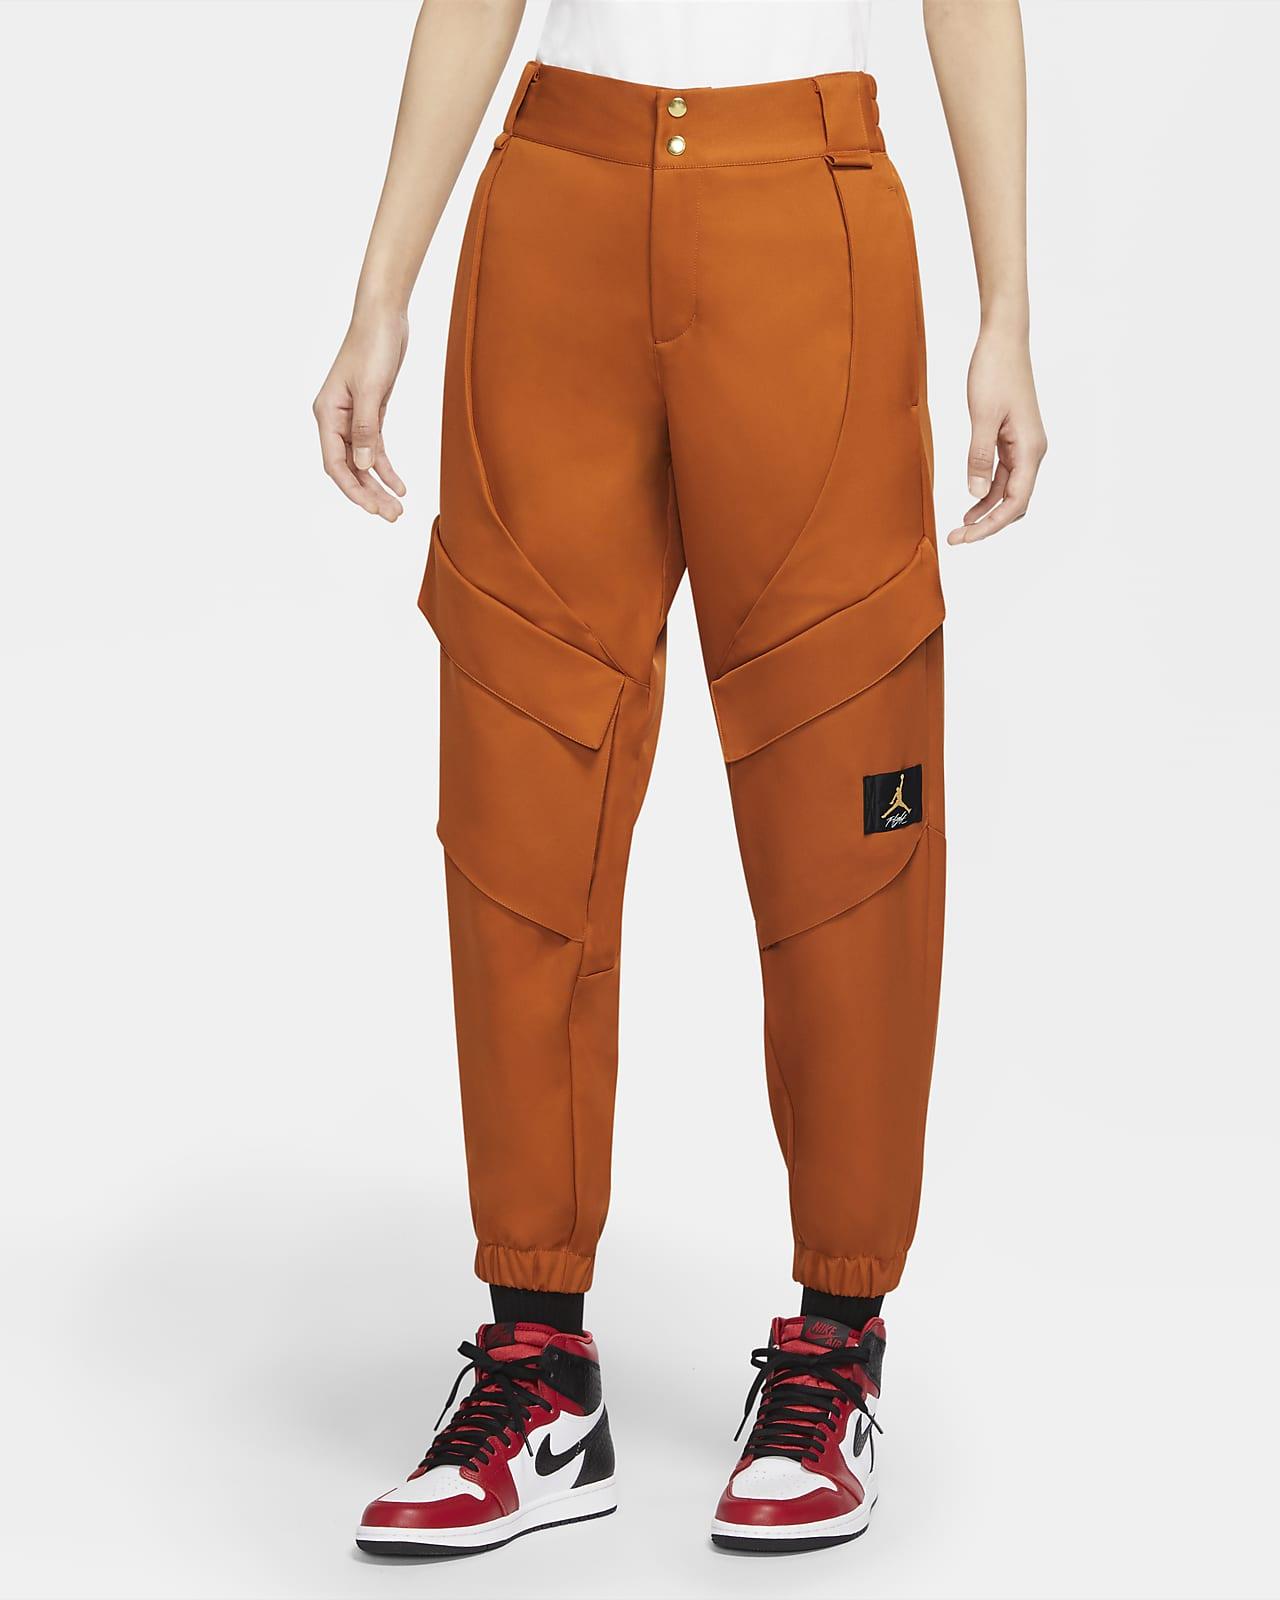 Pantalones cargo para mujer Jordan Essentials